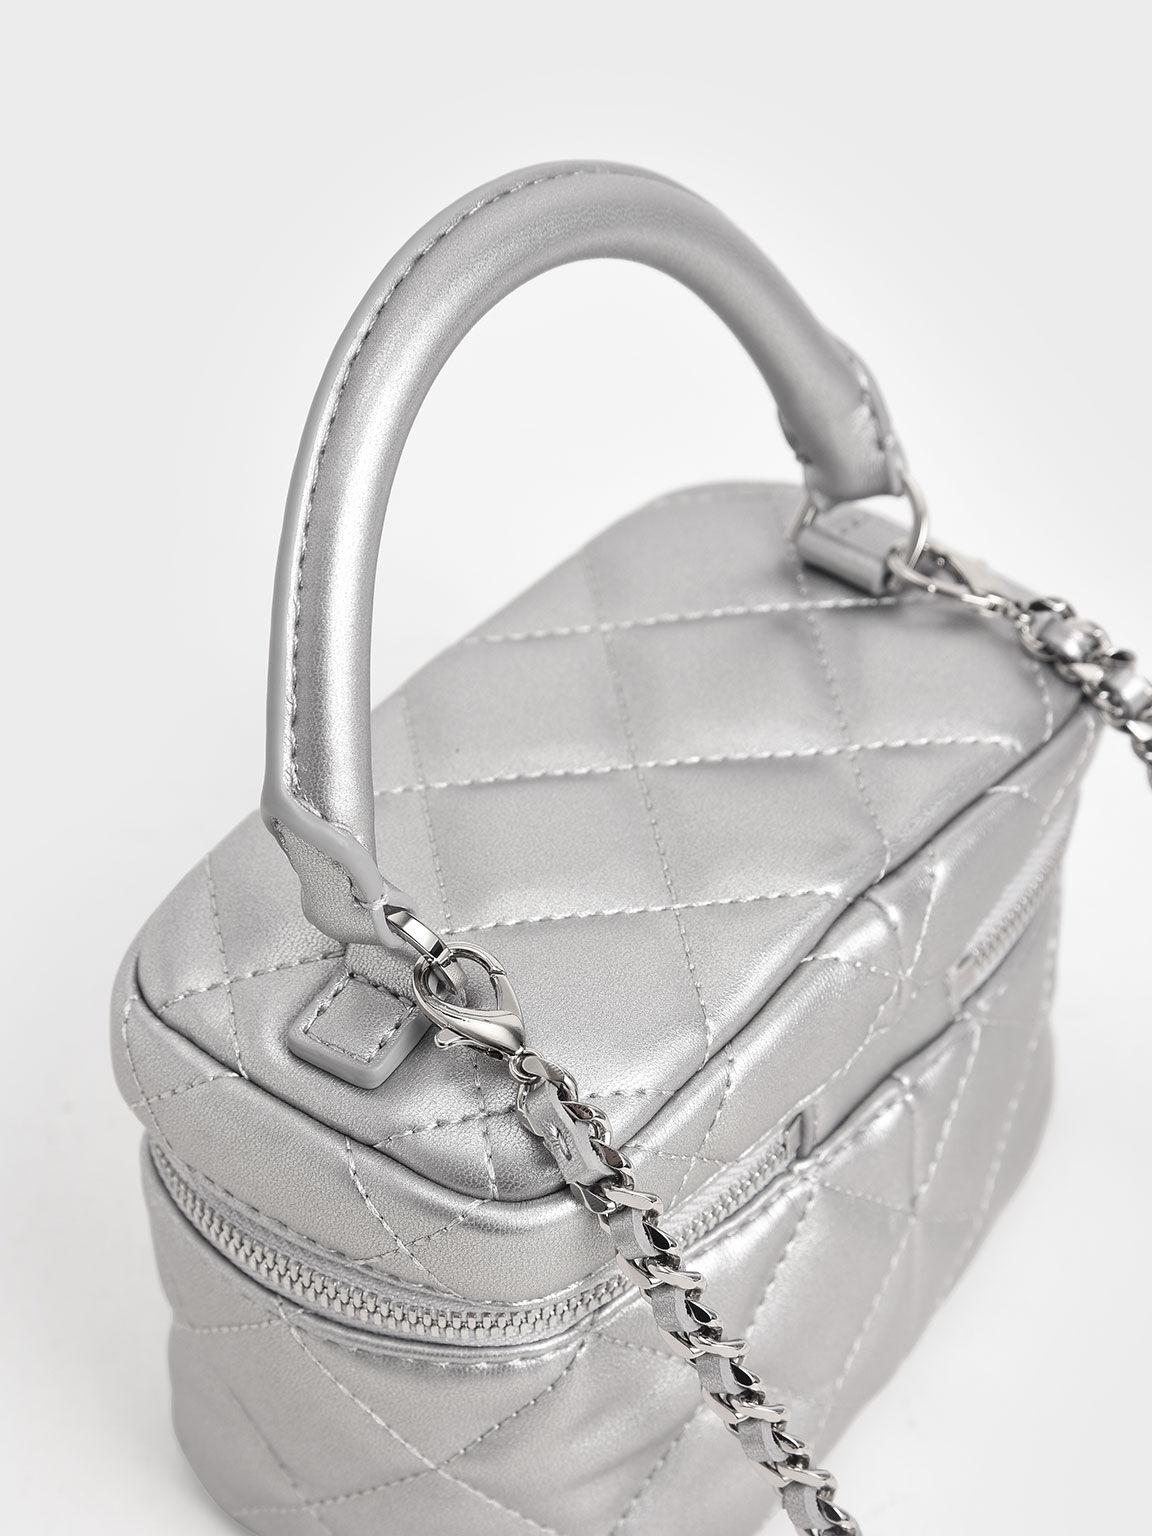 Girls' Two-Way Zip Metallic Quilted Bag, Silver, hi-res